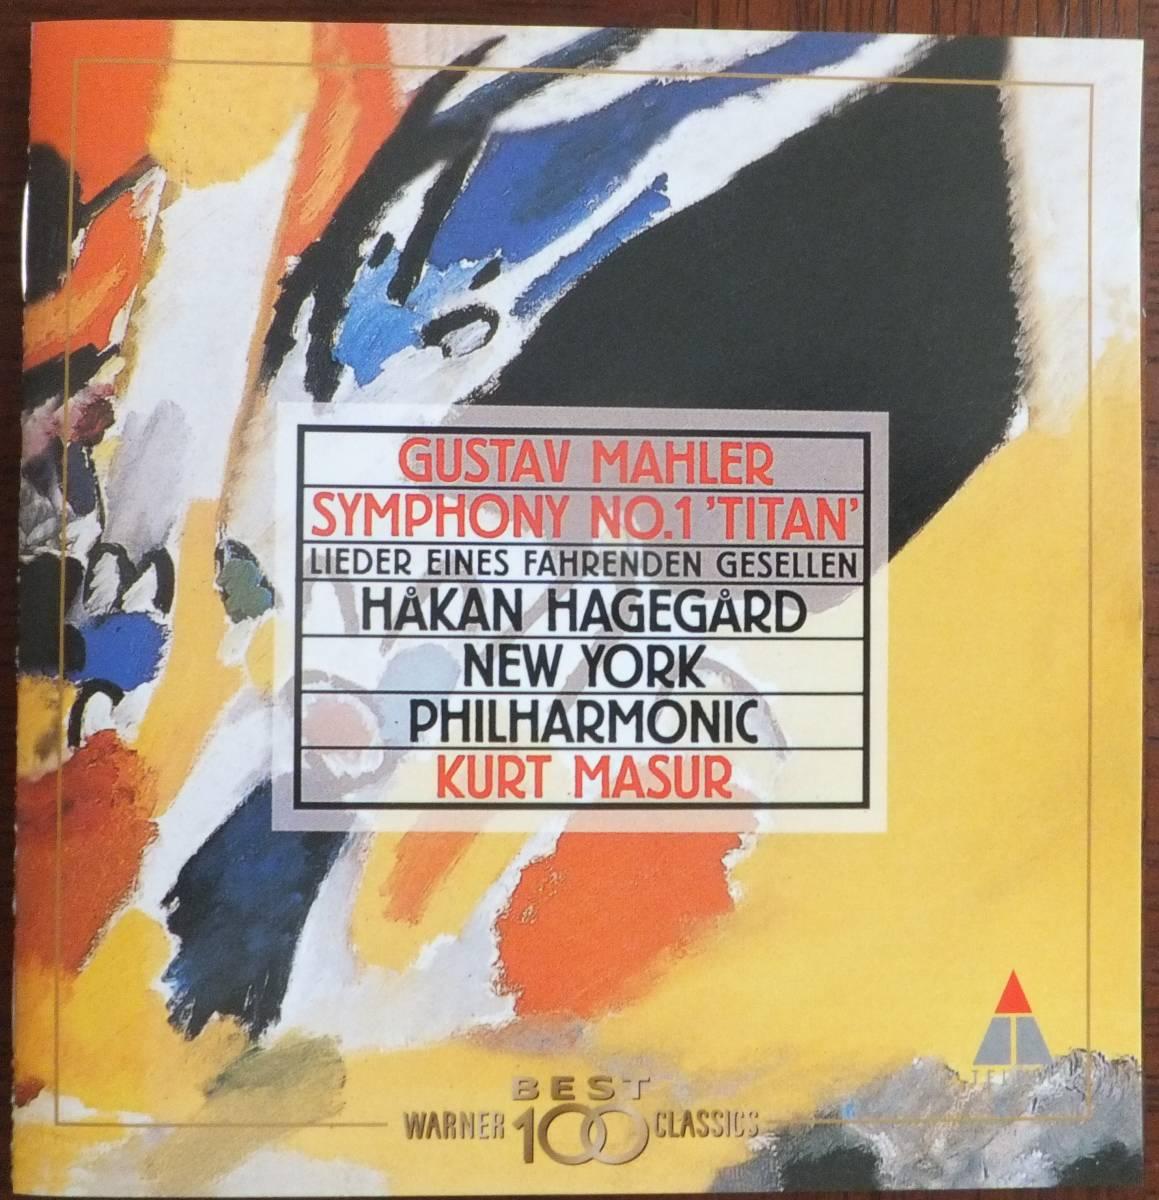 CD マーラー 交響曲第1番「巨人」/歌曲集「さすらう若人の歌」クルト・アズマ指揮 ニューヨーク・フィルハーモニー管弦楽団_画像2